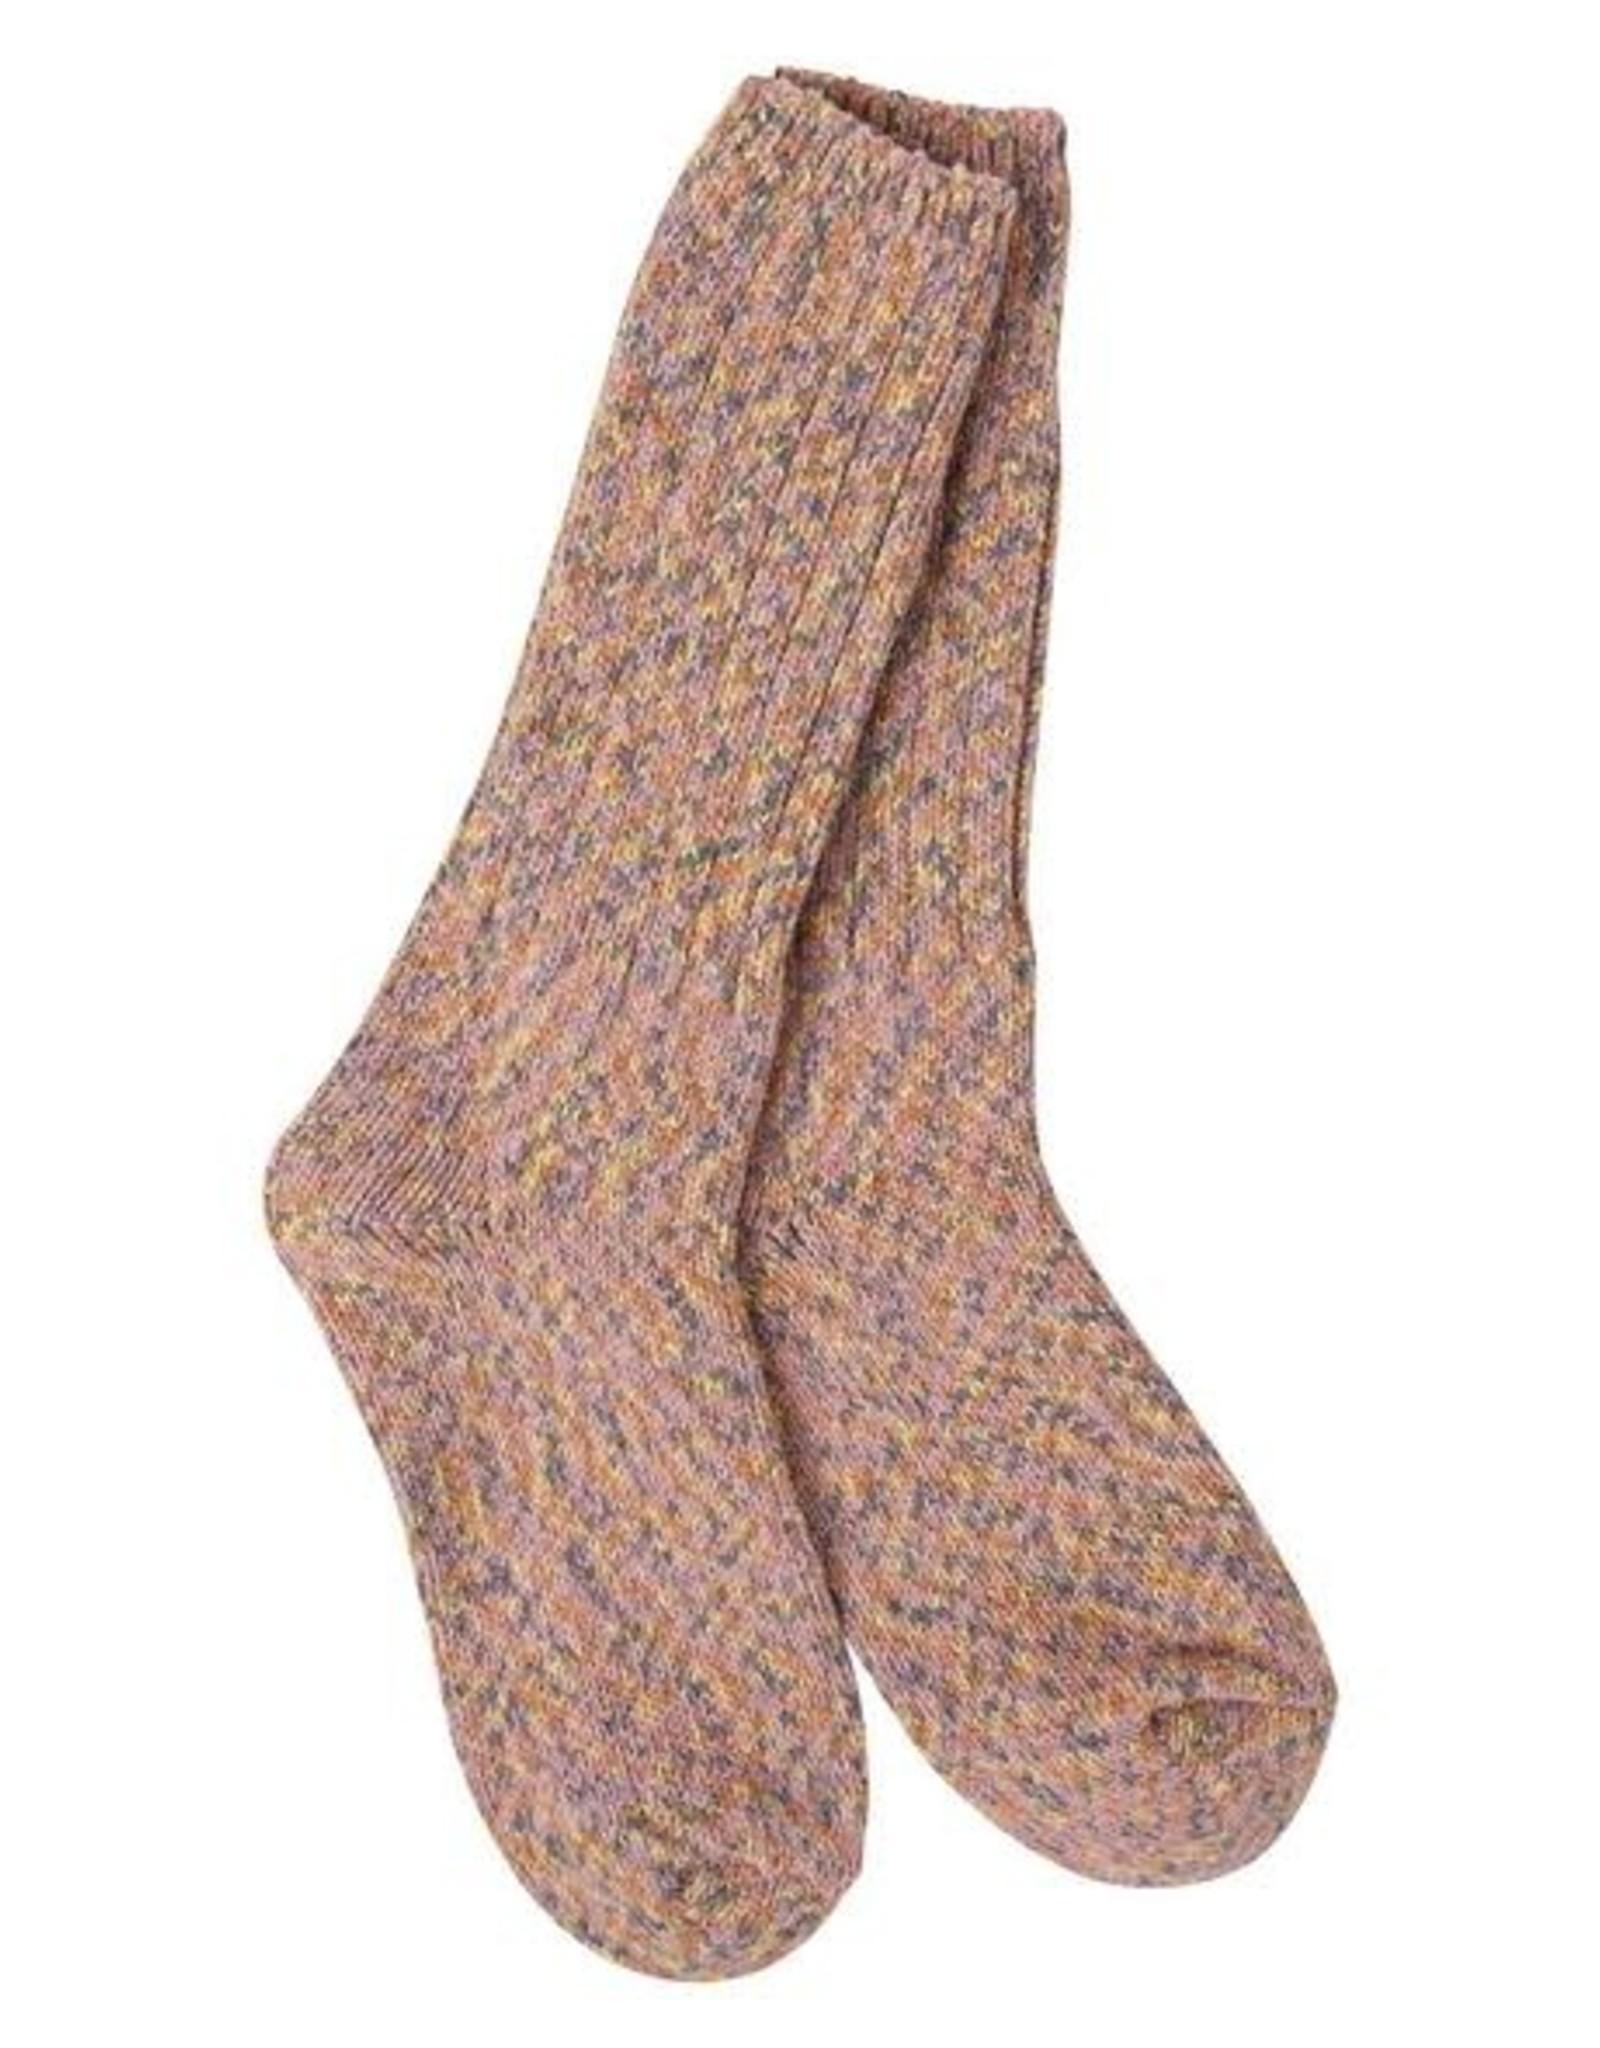 Crescent Sock Company Women's Socks Golden Fields